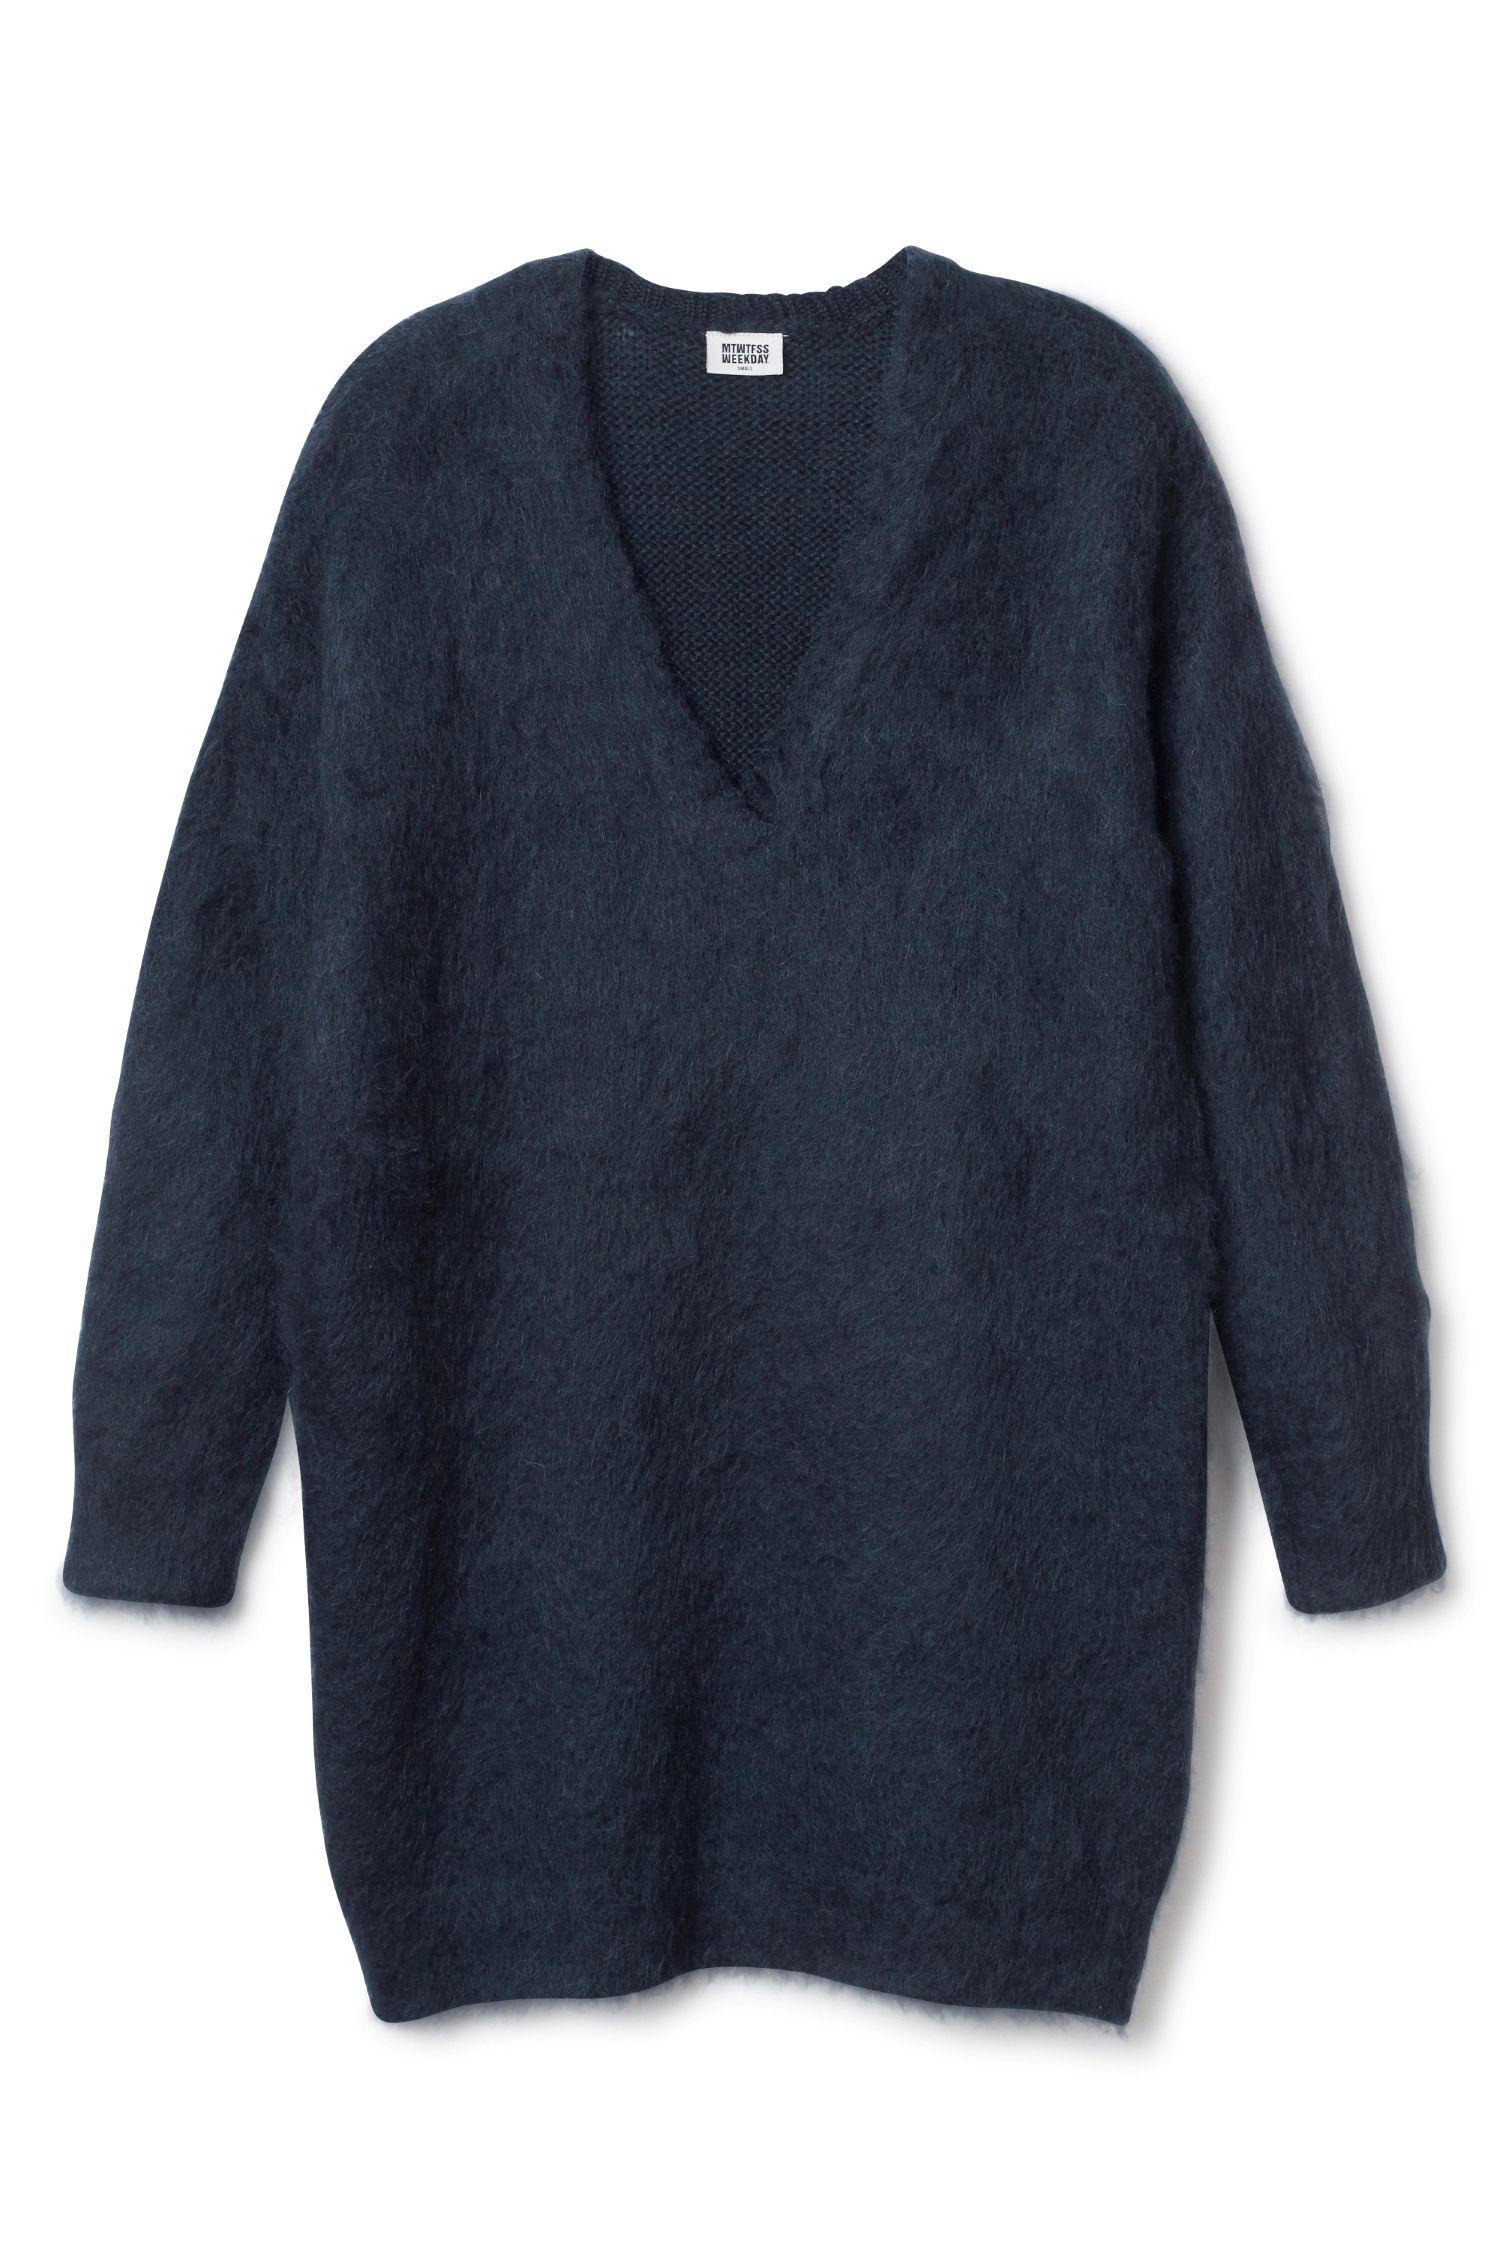 Wishlist Sweater Mtwtfss Weekday Peking Knit Pinterest wtUqUxnIT